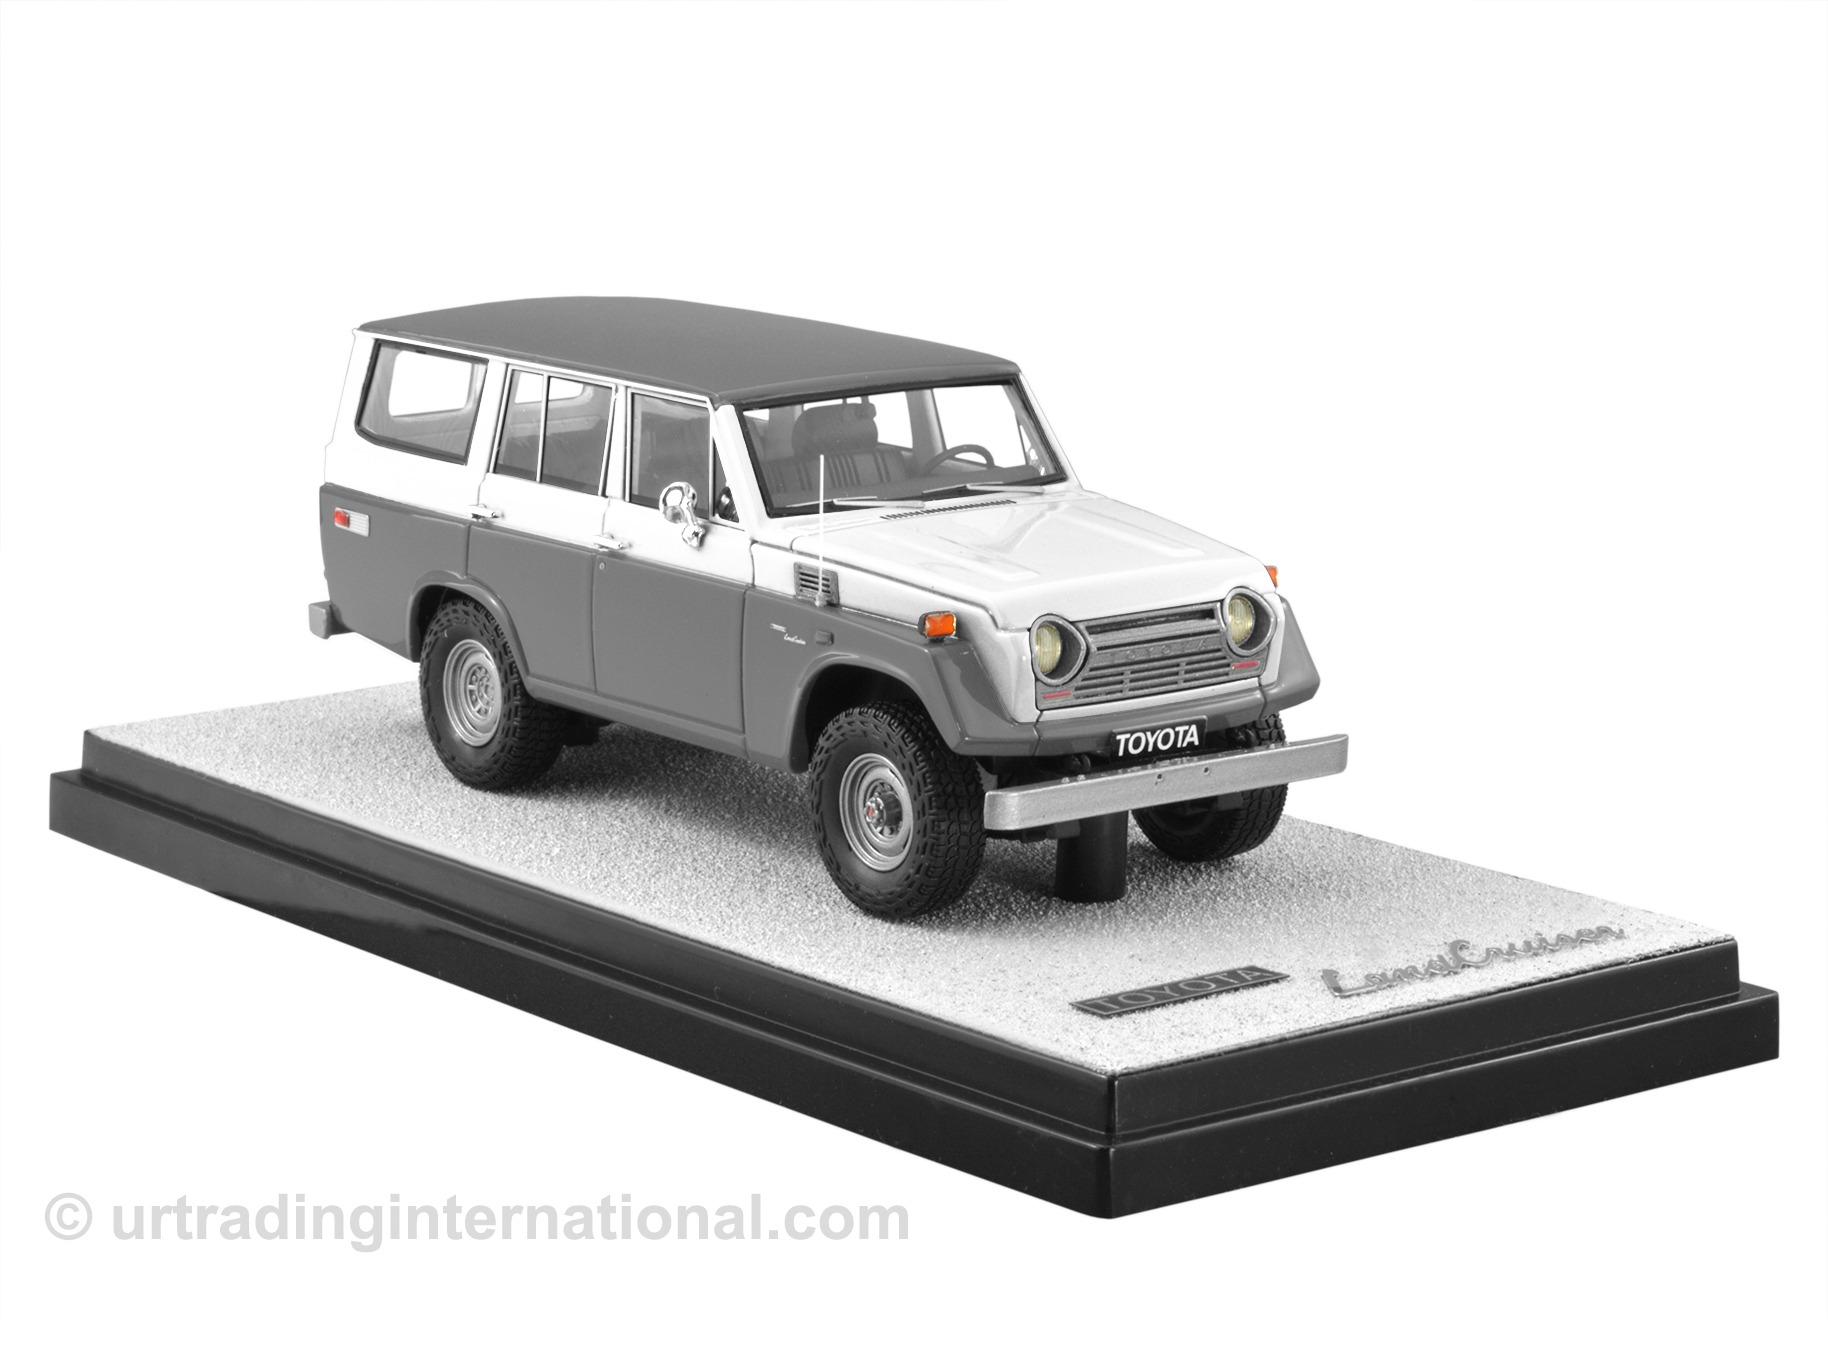 1974 Toyota Land Cruiser FJ55 – Grey/White LHD